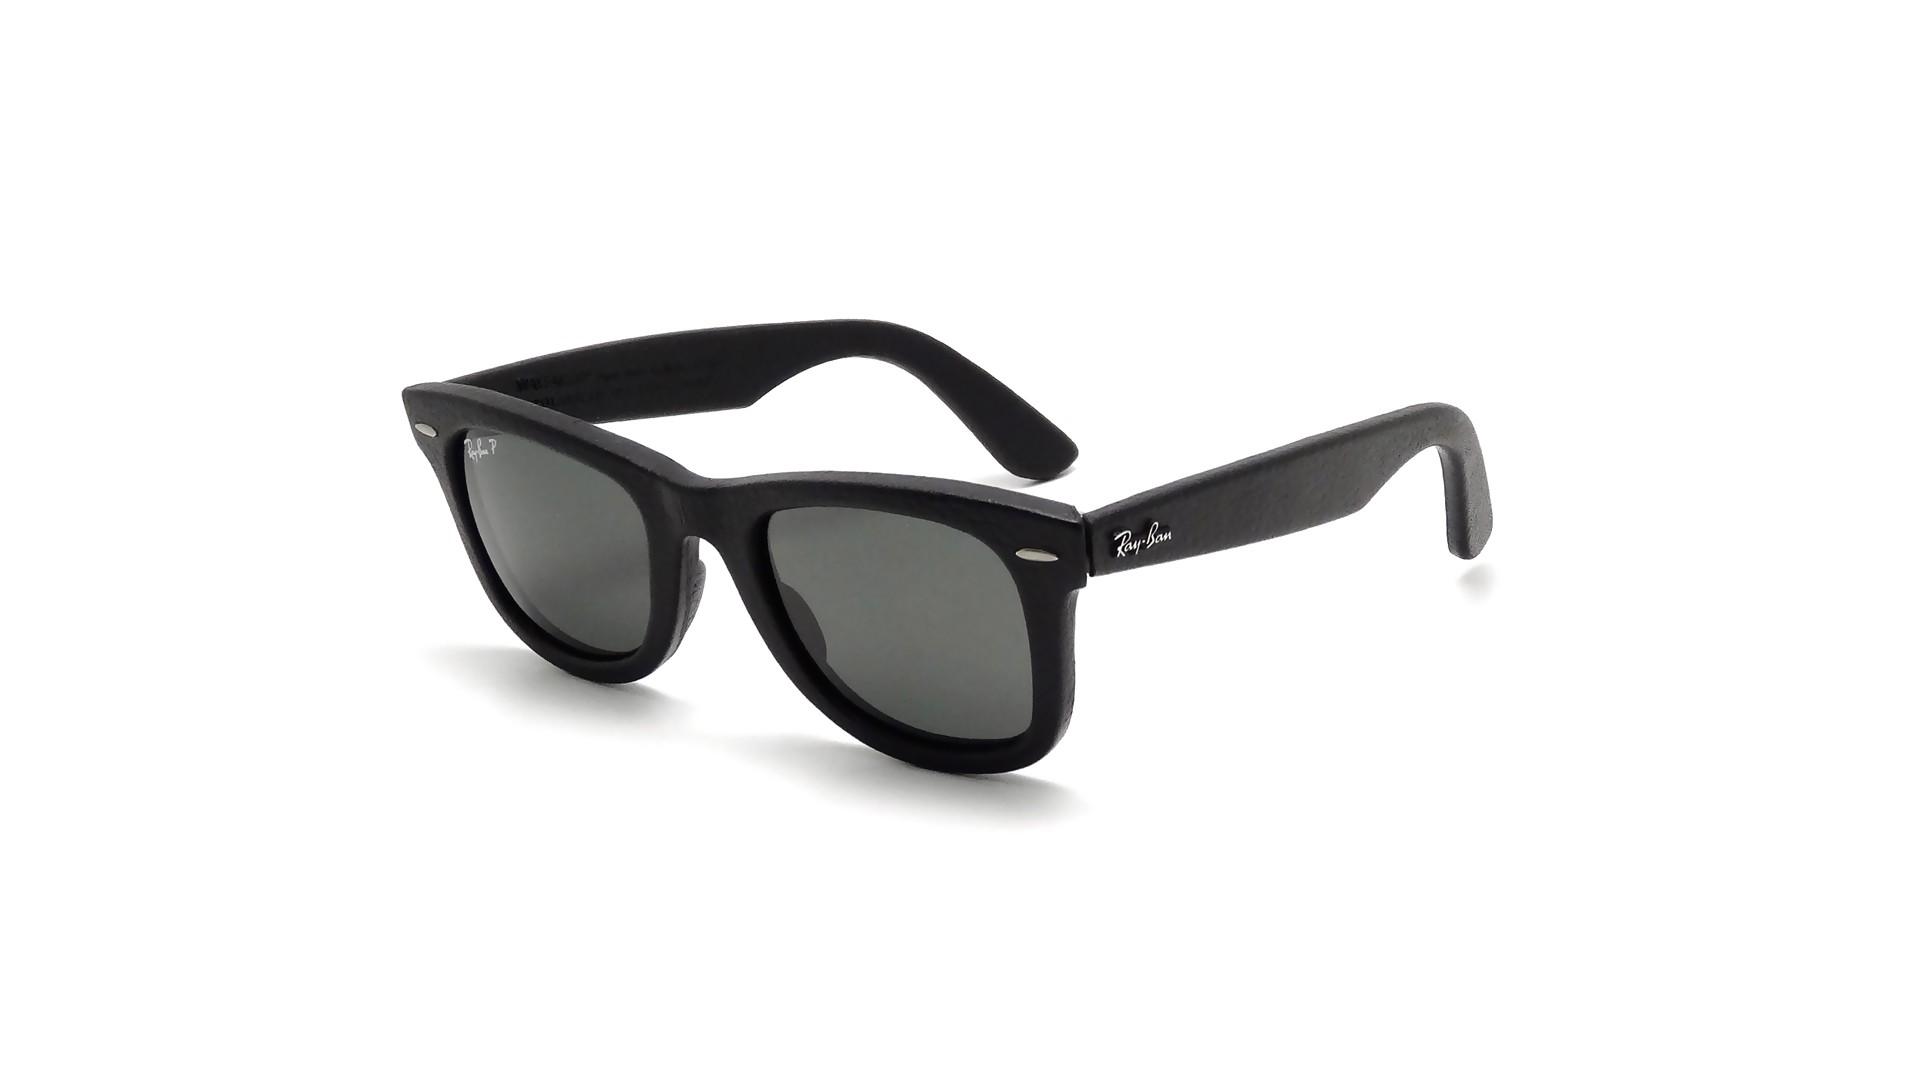 2f90f8f4e5e Sunglasses Ray-Ban Original Wayfarer Genuine Leather Black RB2140QM 1152 N5  50-22 Medium Polarized